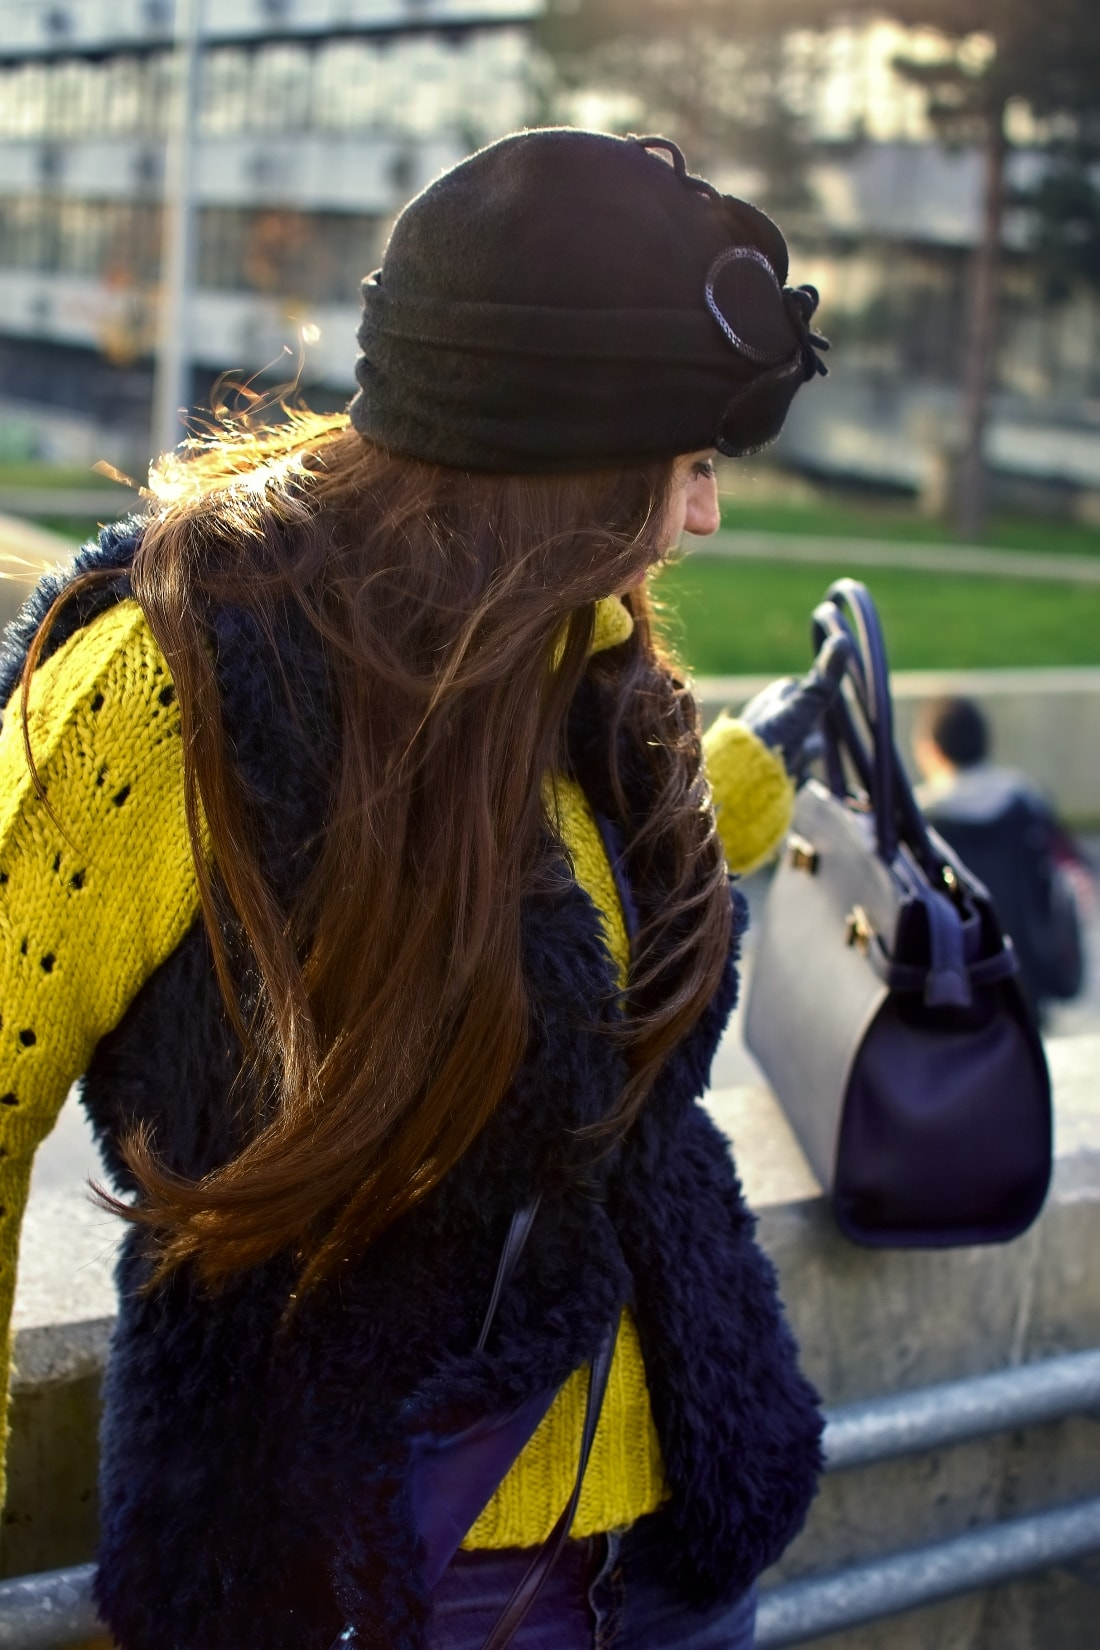 IRRESISTIBLE ME_Katharine-fashion is beautiful_blog 3_hair extension_irresistible me_beauty_Modrá kožušinová vesta_Katarína Jakubčová_Fashion blogger